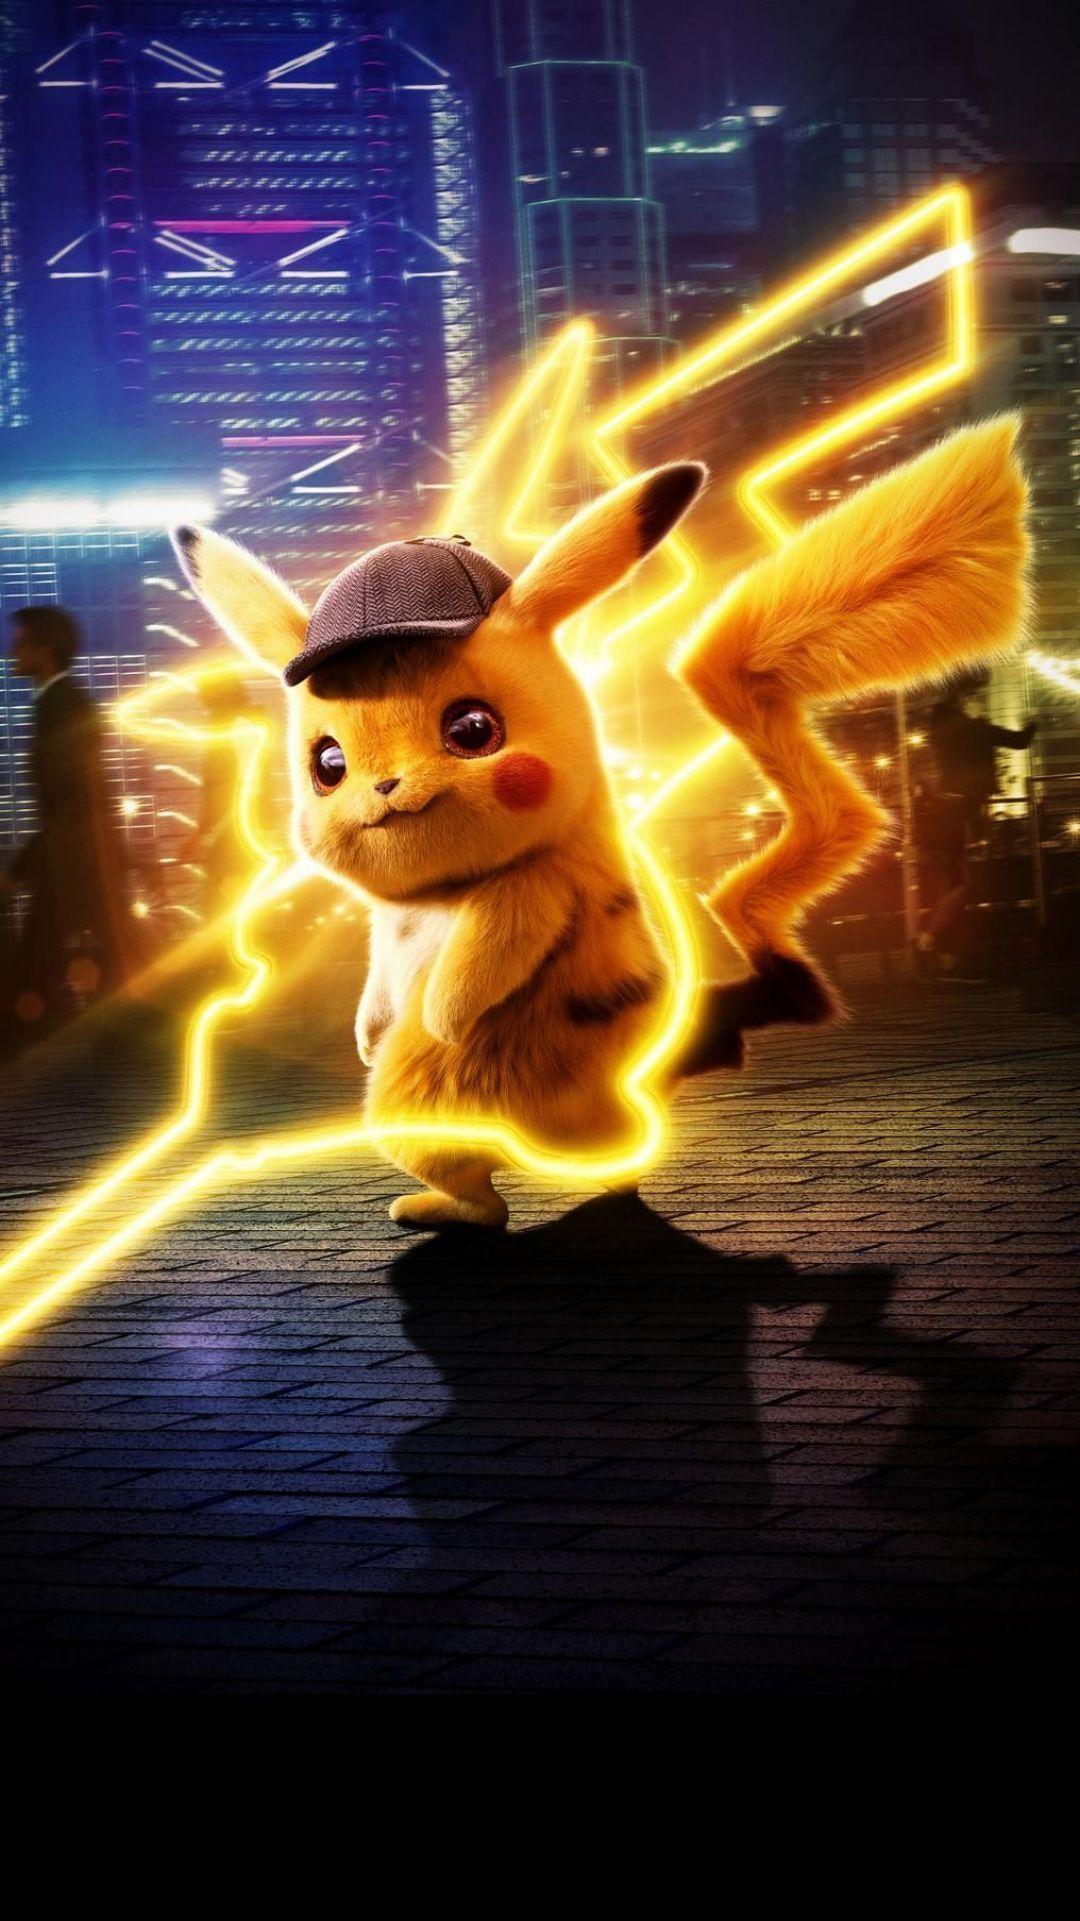 Pokémon 4K HD Wallpapers - Wallpaper Cave